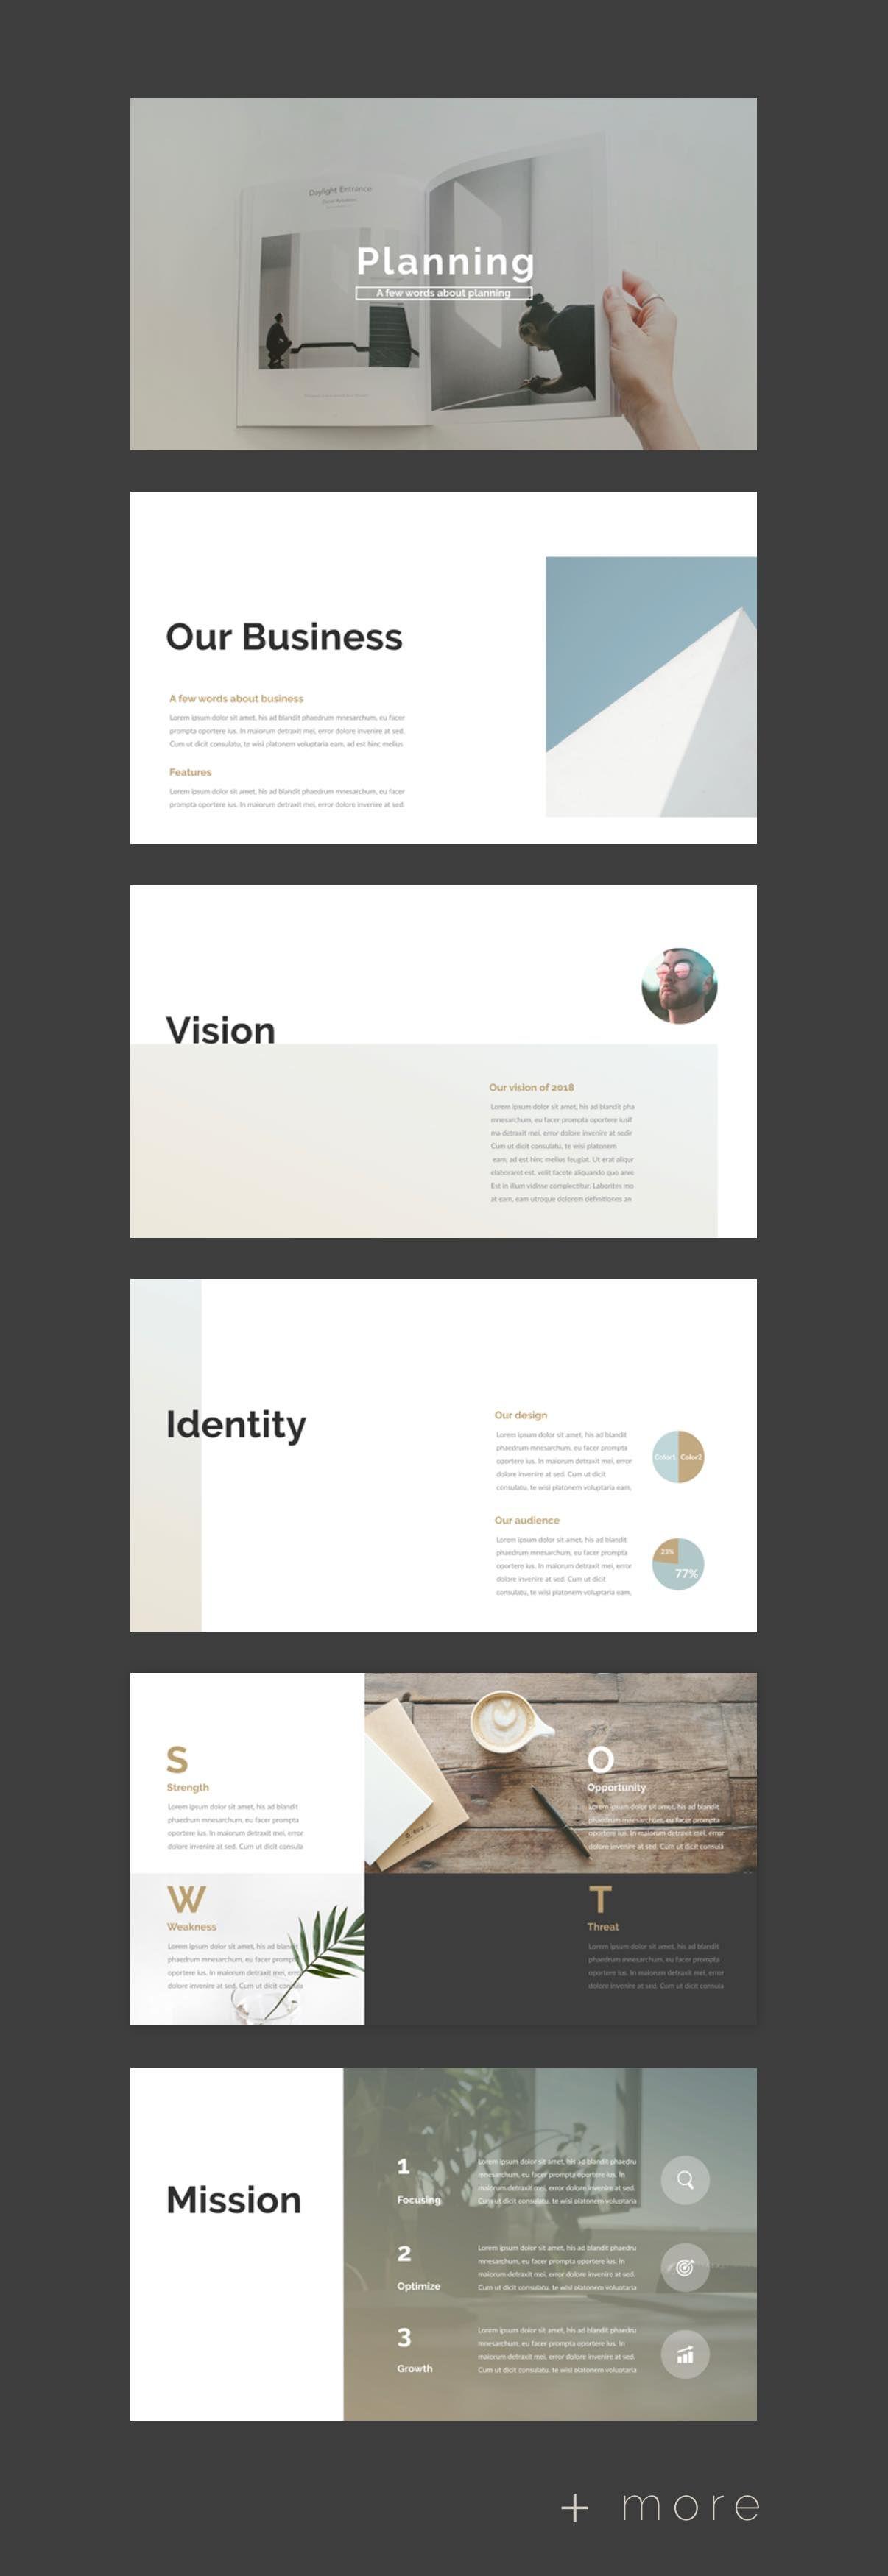 Simple Planner Presentation Template Presentation Business